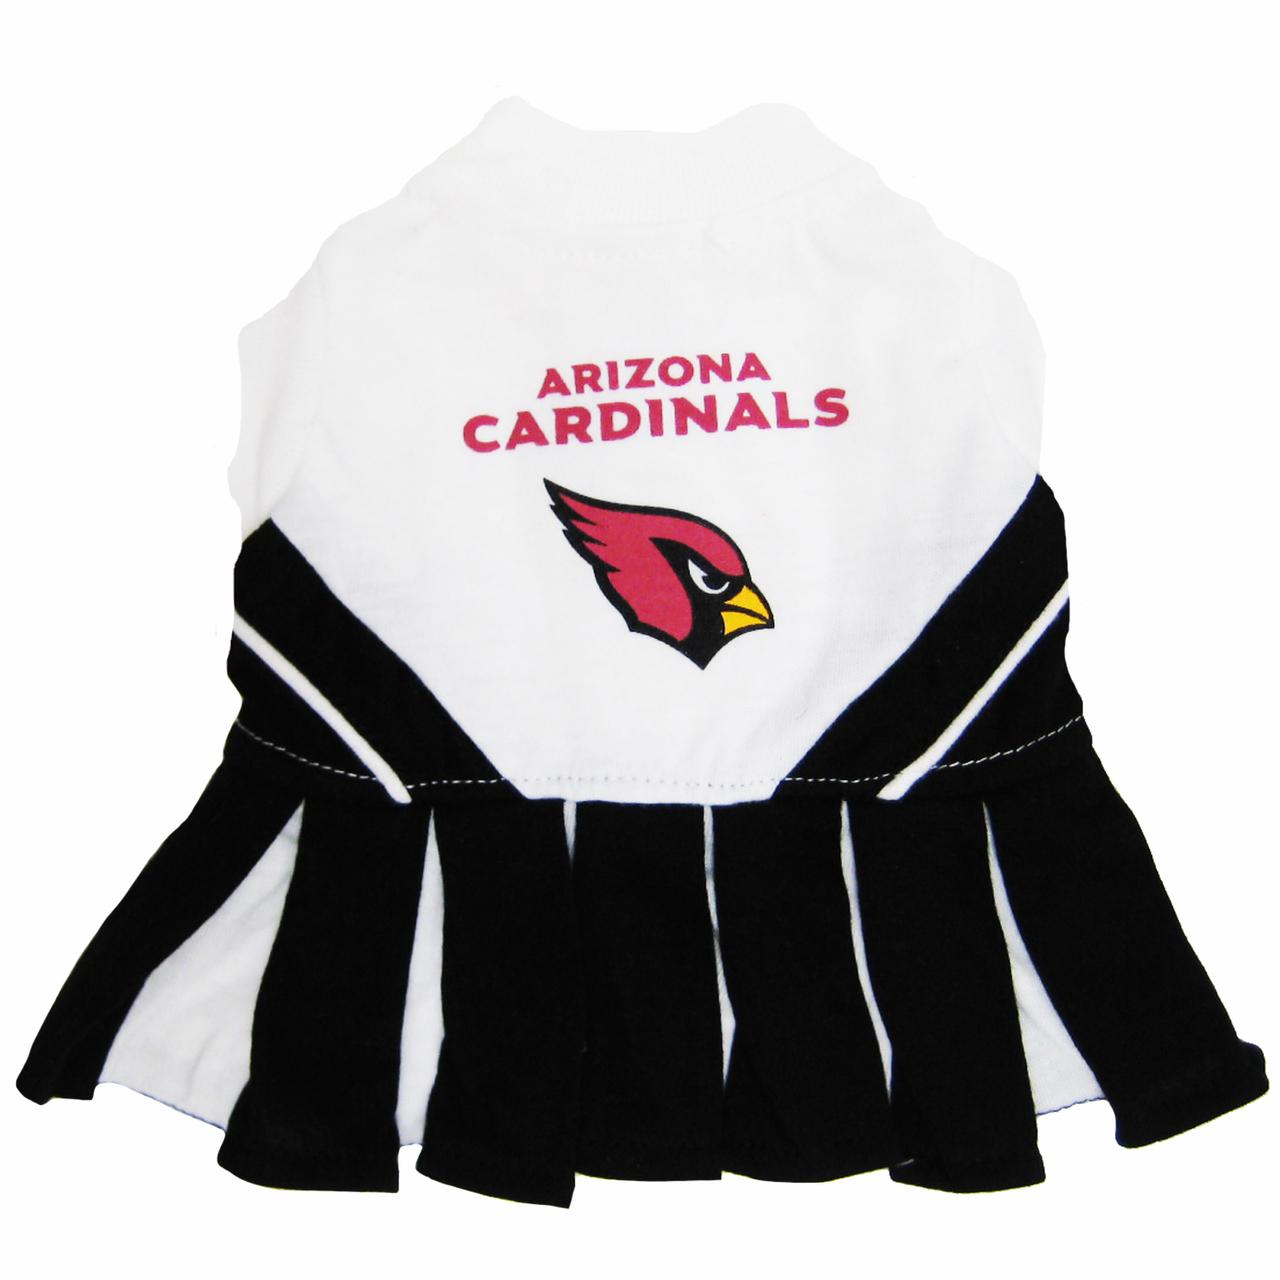 Hot Dog Arizona Cardinals NFL Football Pet Cheerleader Outfit